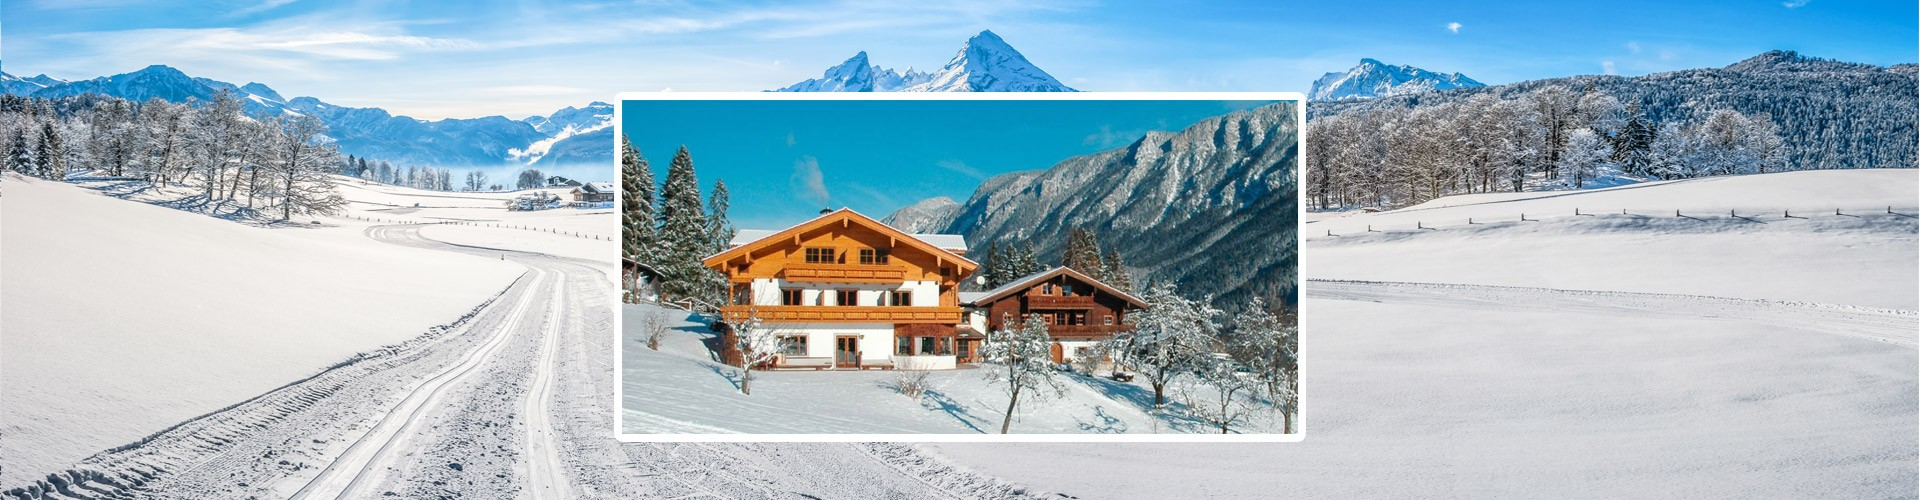 Alpenhotel Hundsreitlehen im Winter